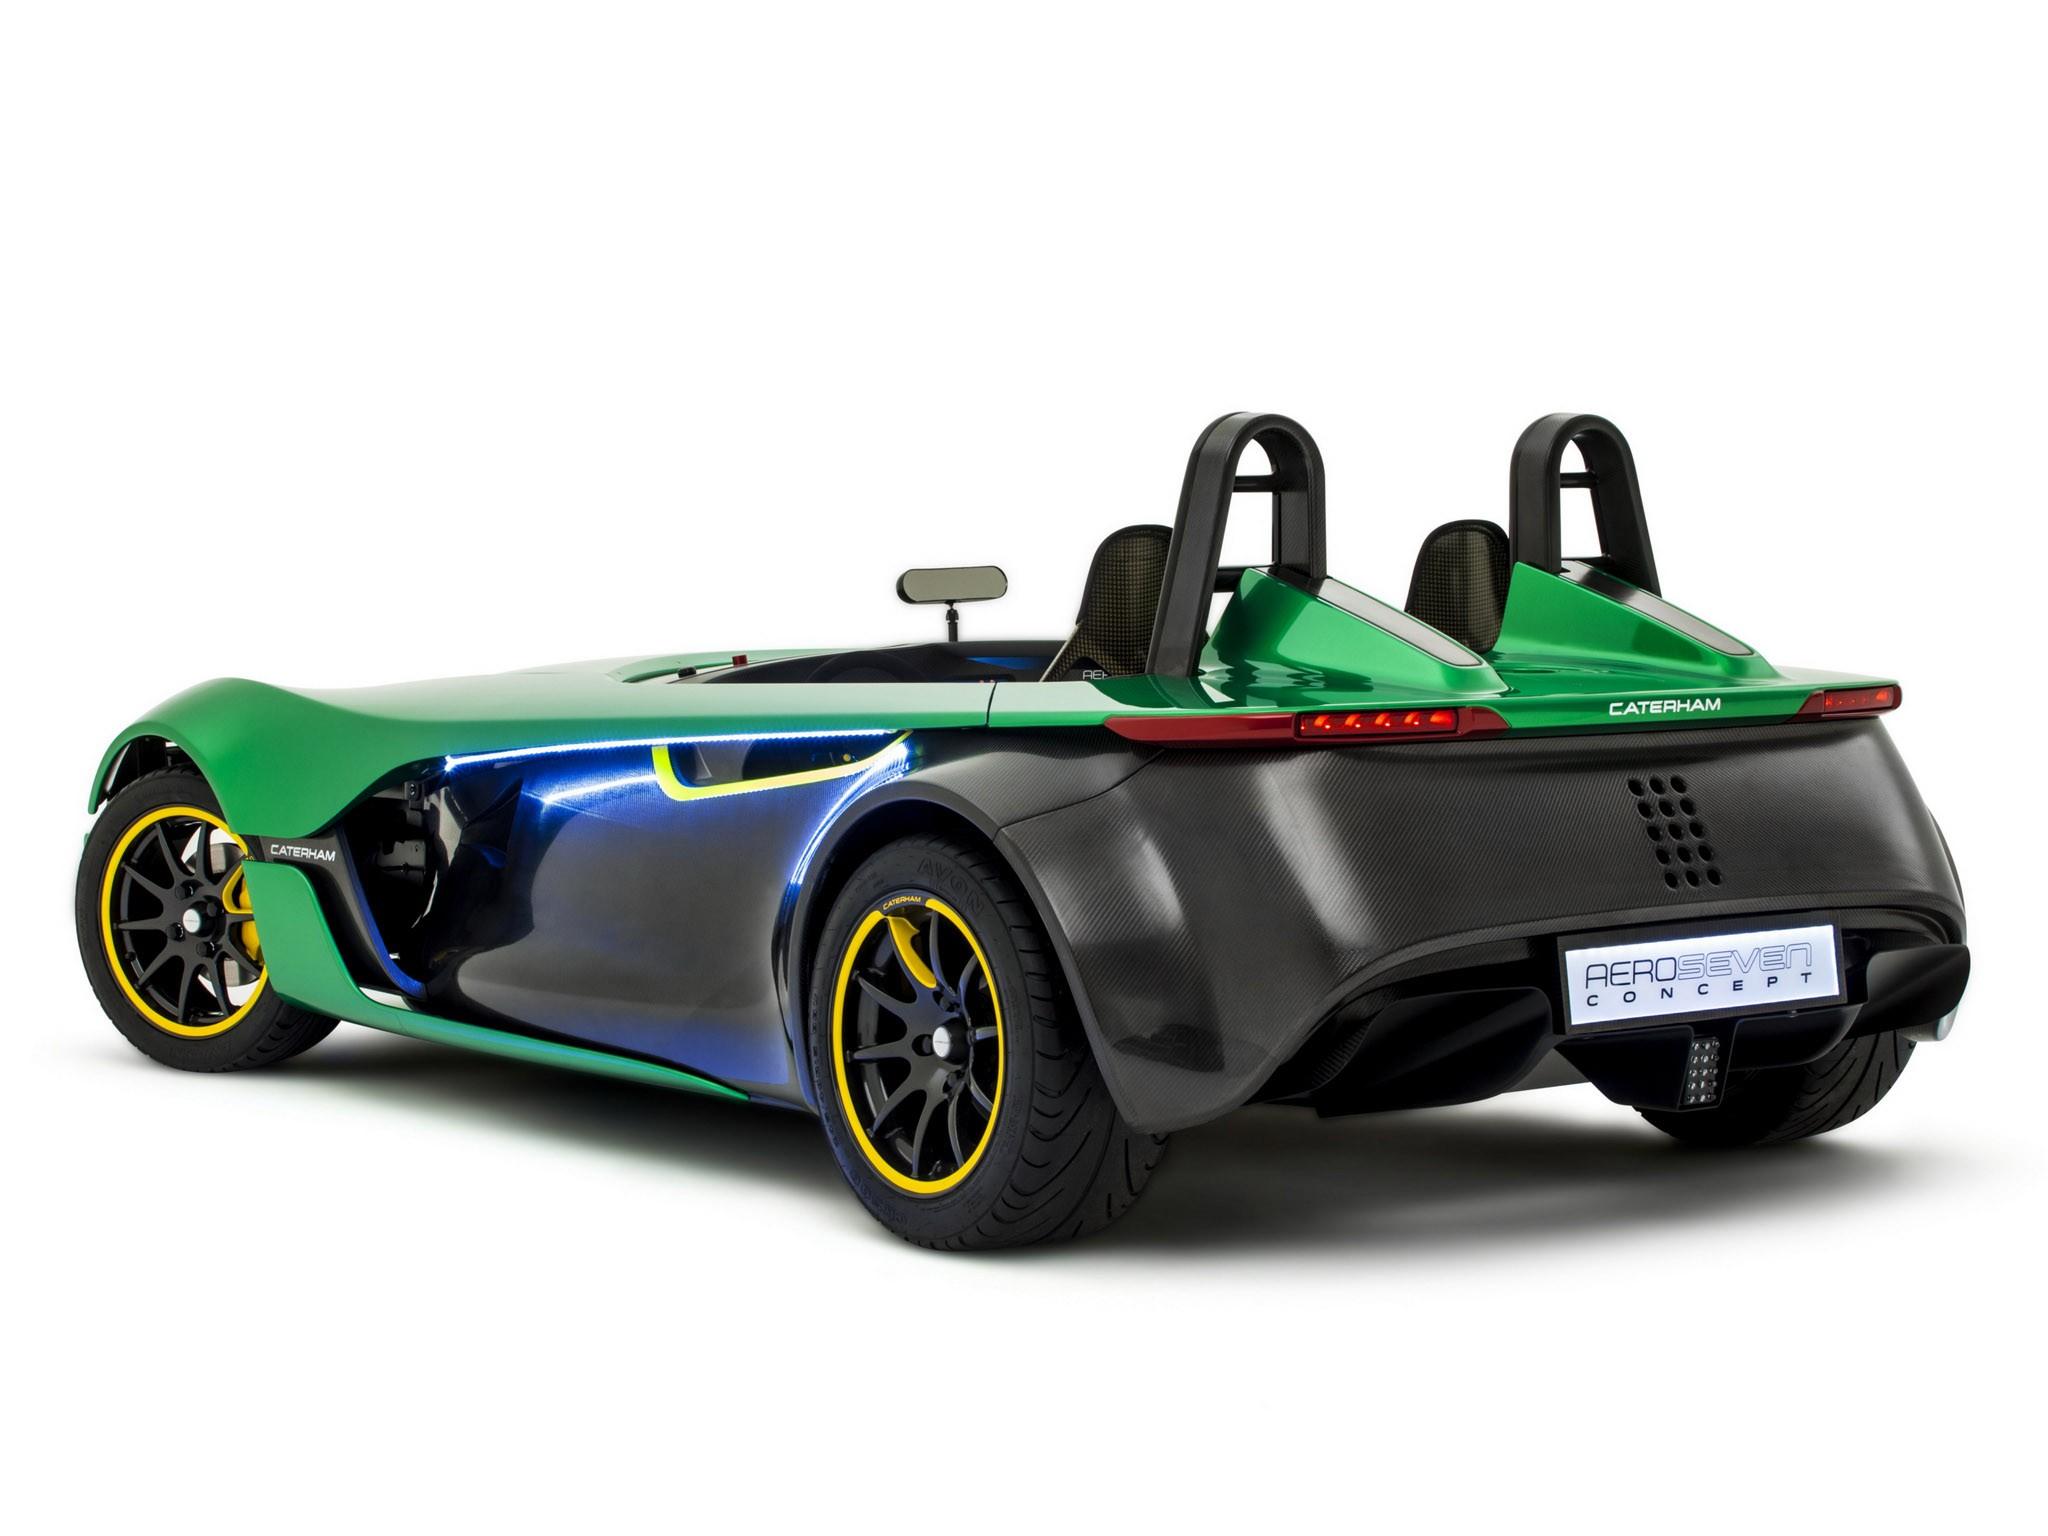 2013 Caterham Aero Seven Concept